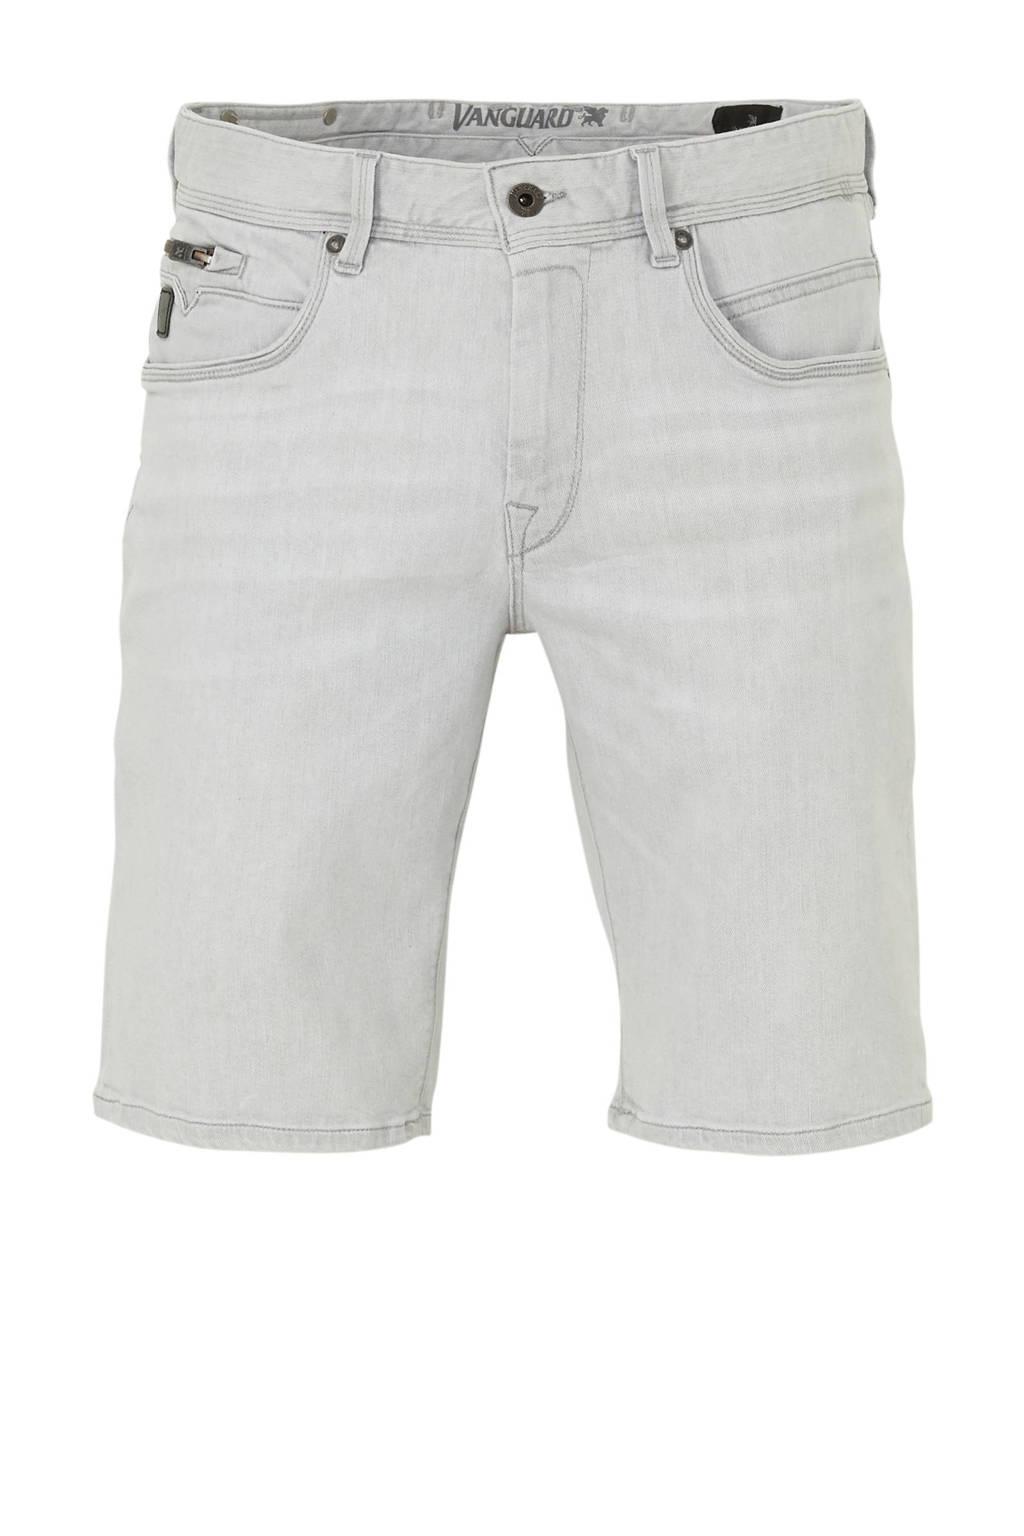 Vanguard regular fit jeans short lichtgrijs, Lichtgrijs